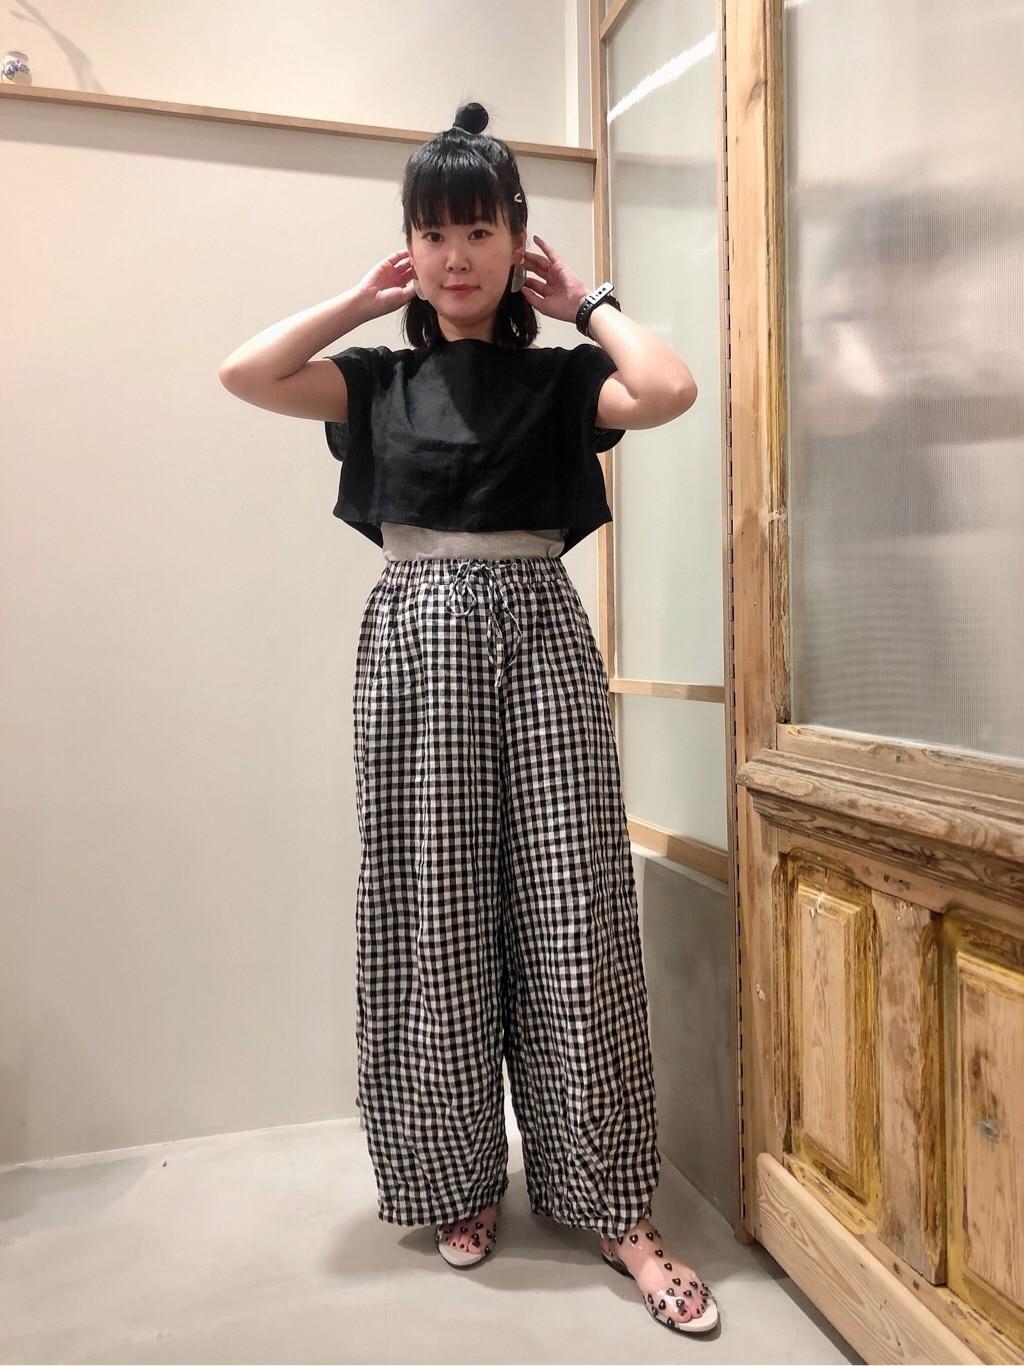 bulle de savon 渋谷スクランブルスクエア 身長:157cm 2020.06.24